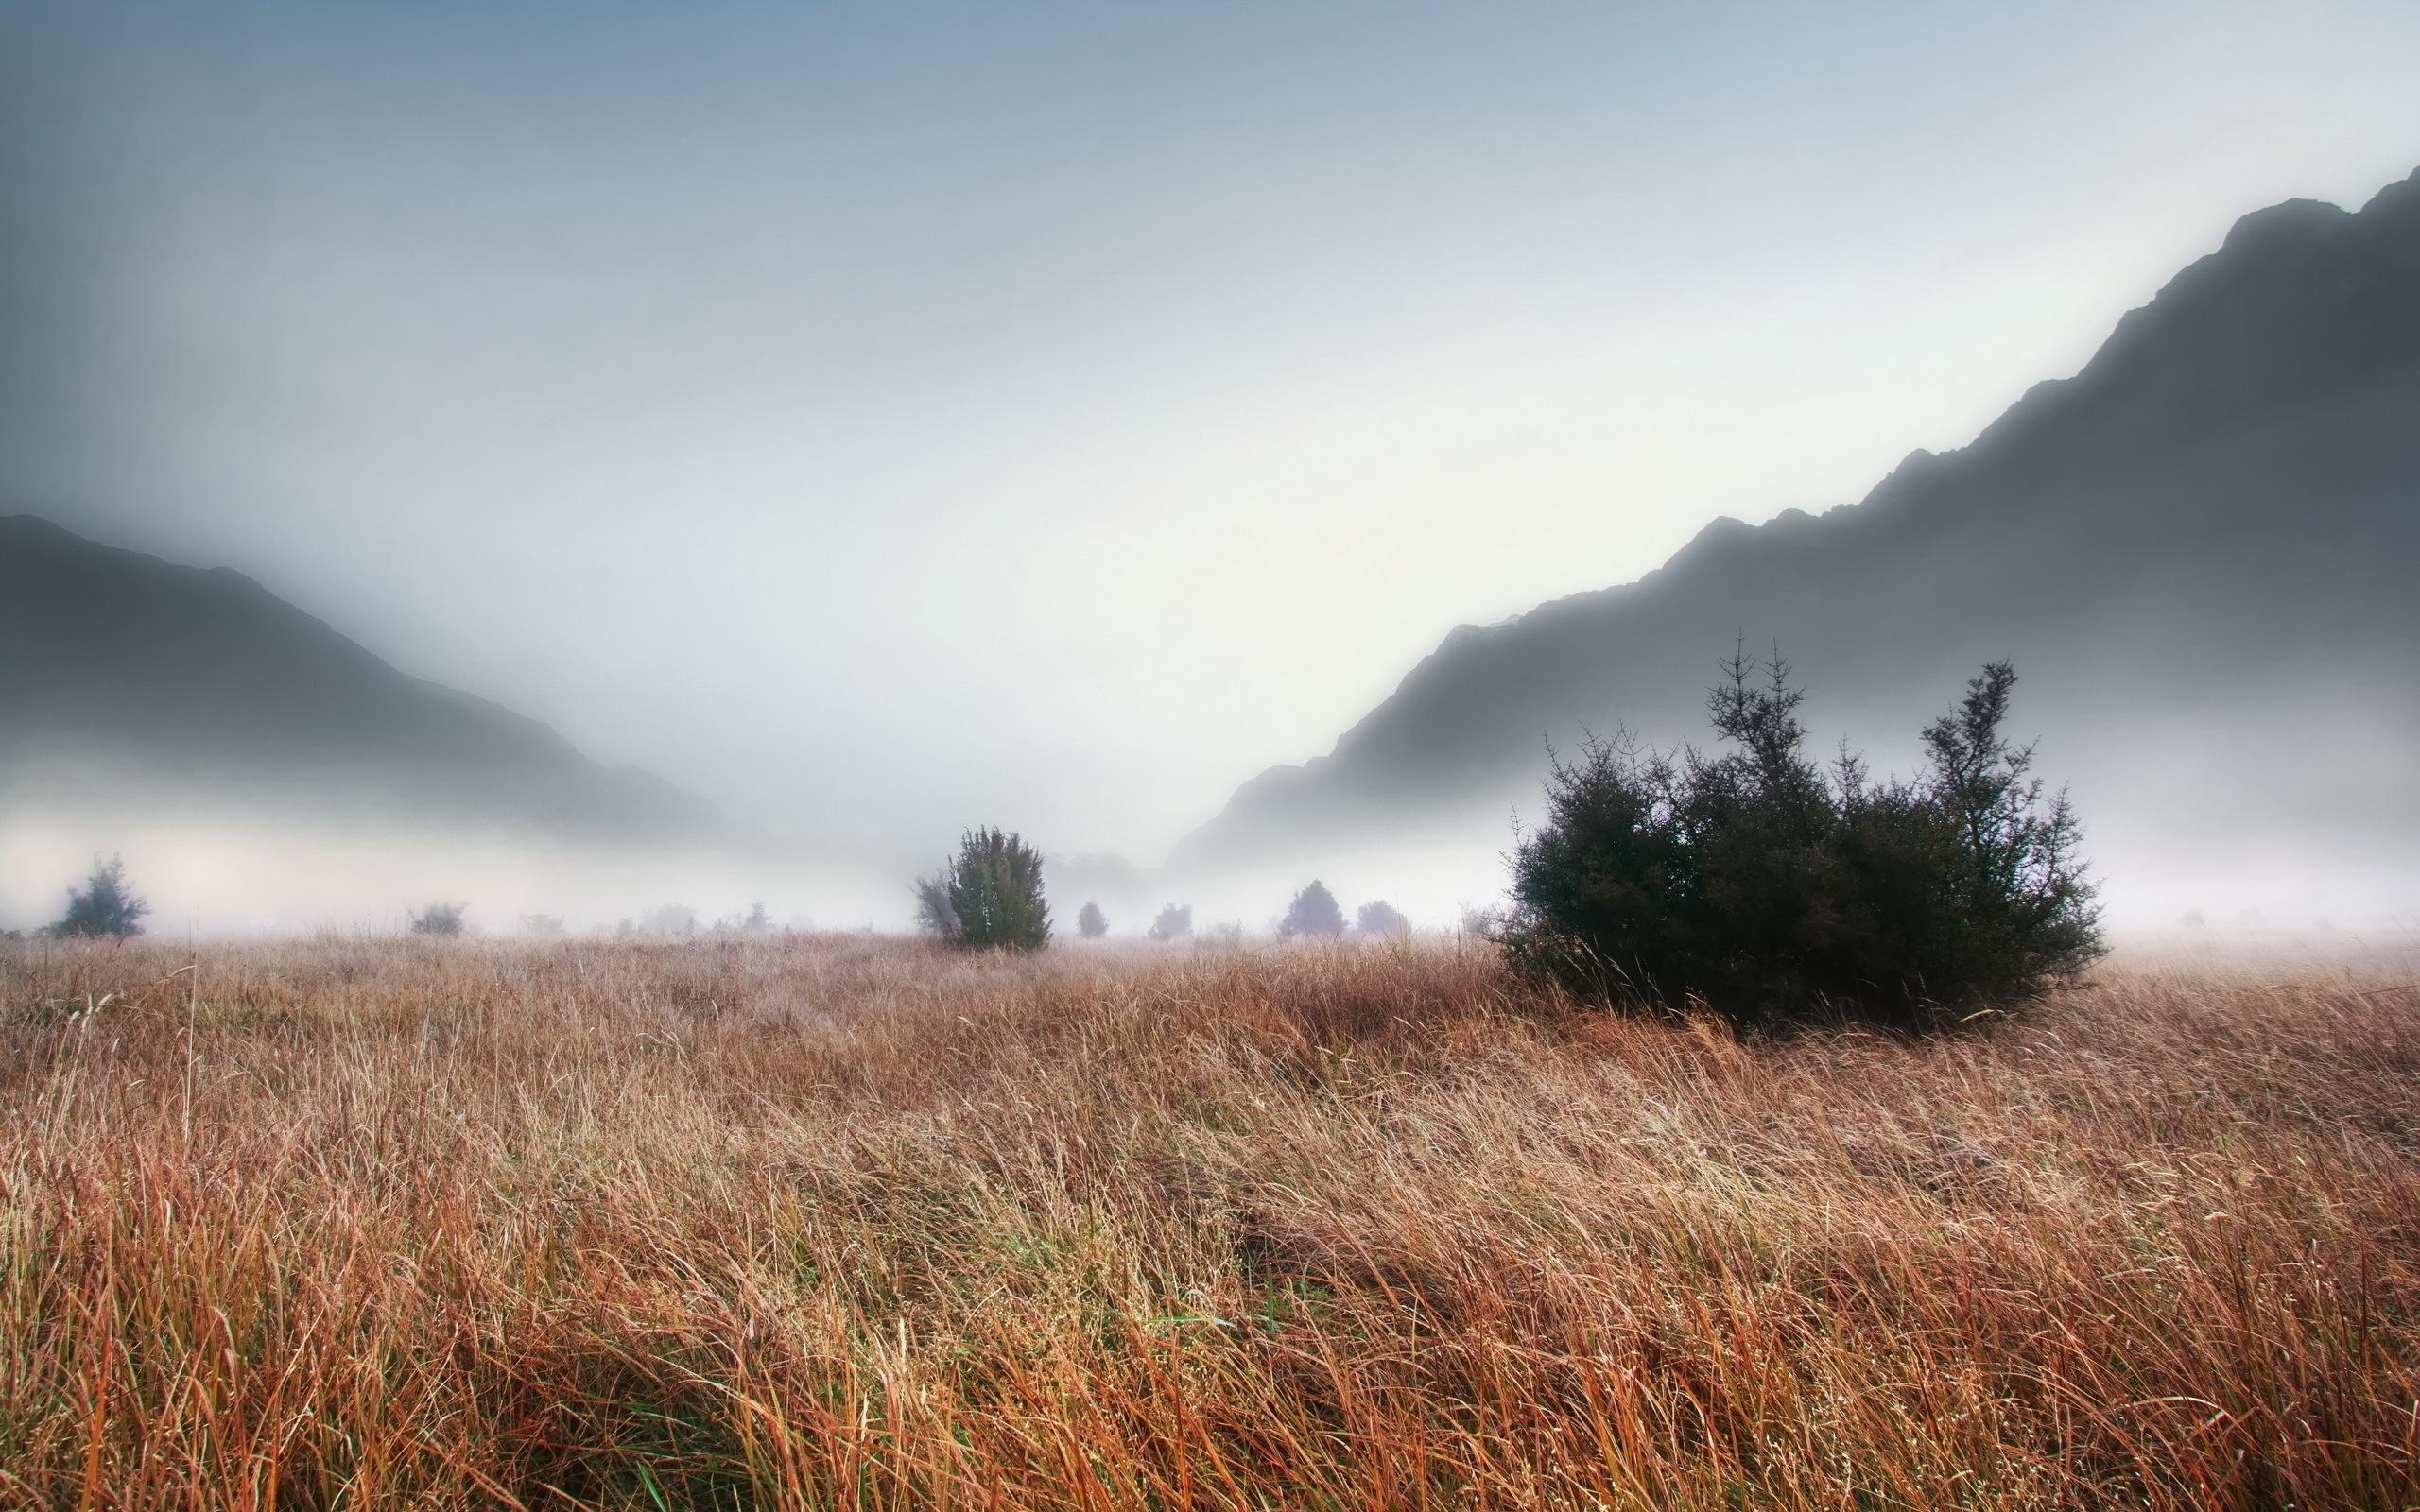 Foggy grass landscape wallpaper 2560x1600 30129 for Grass landscape